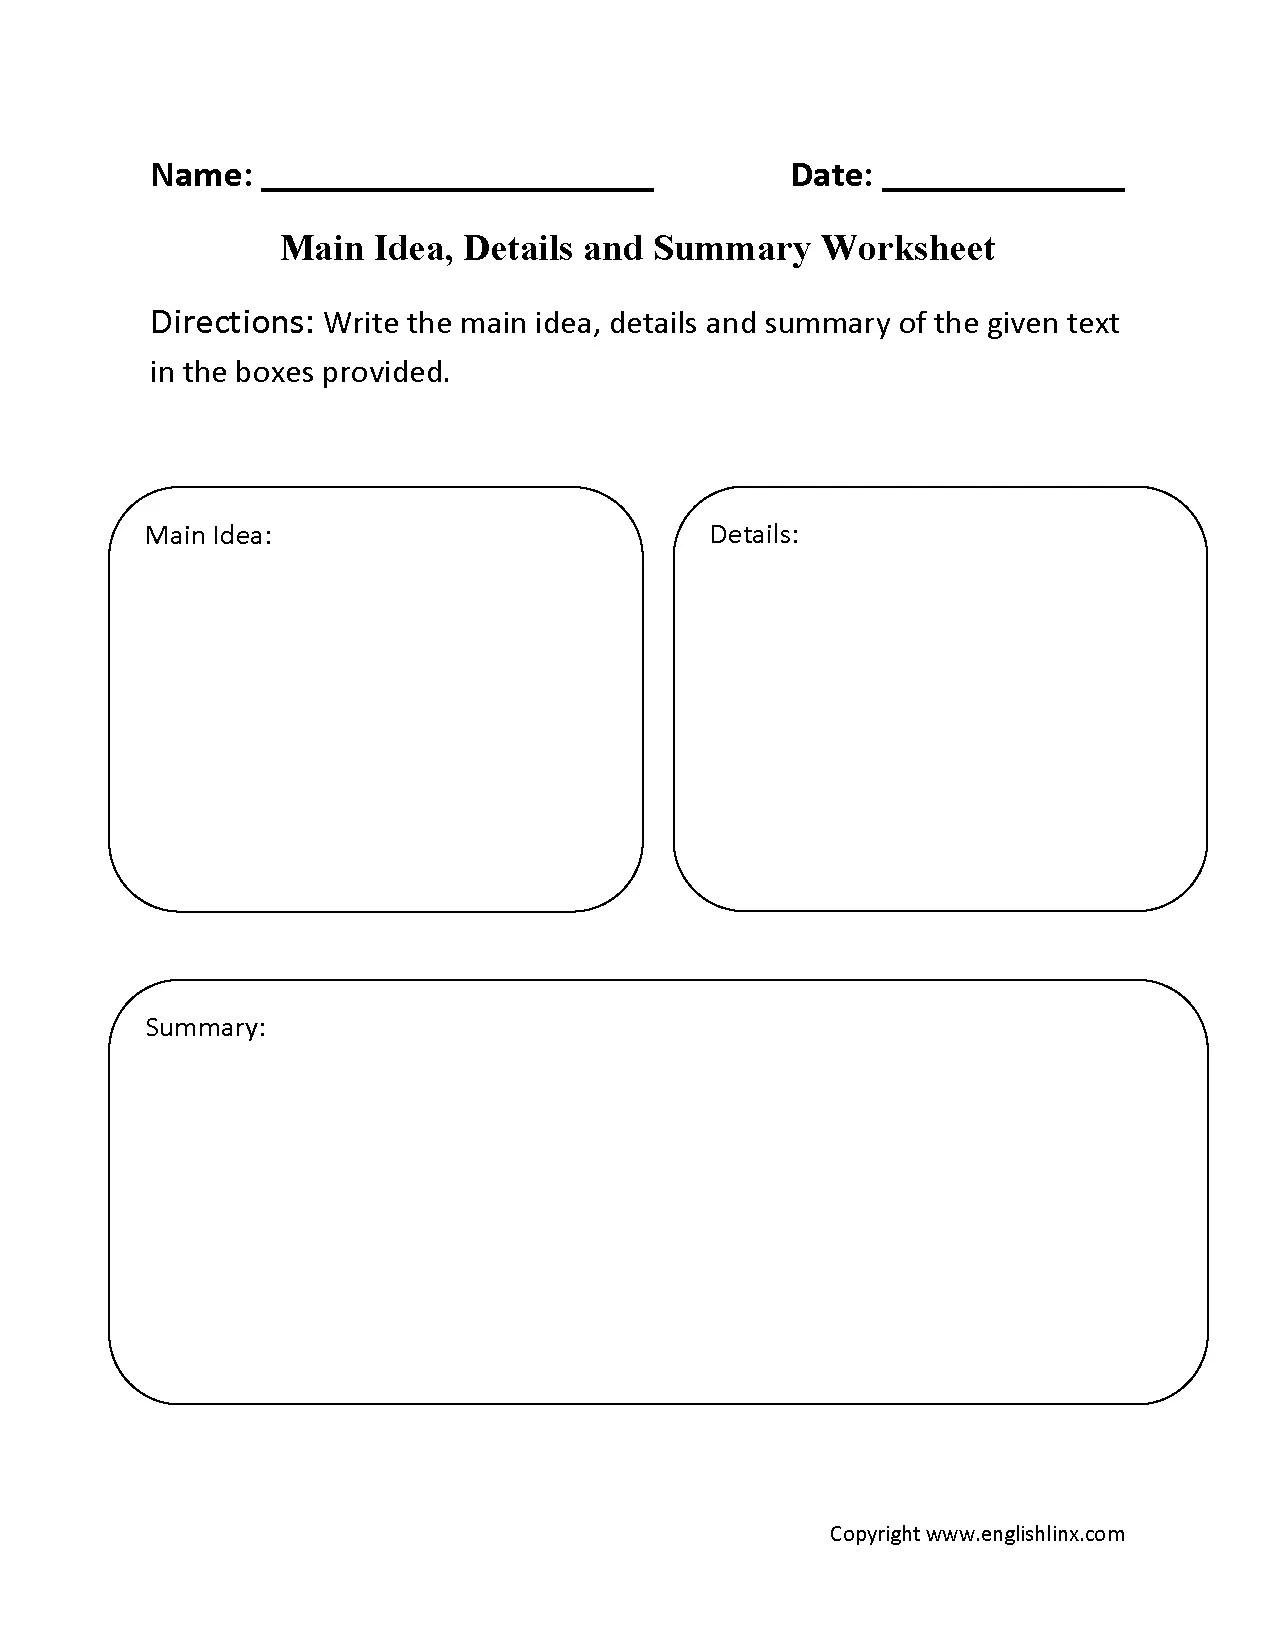 29 Comprehensive Main Idea Worksheets